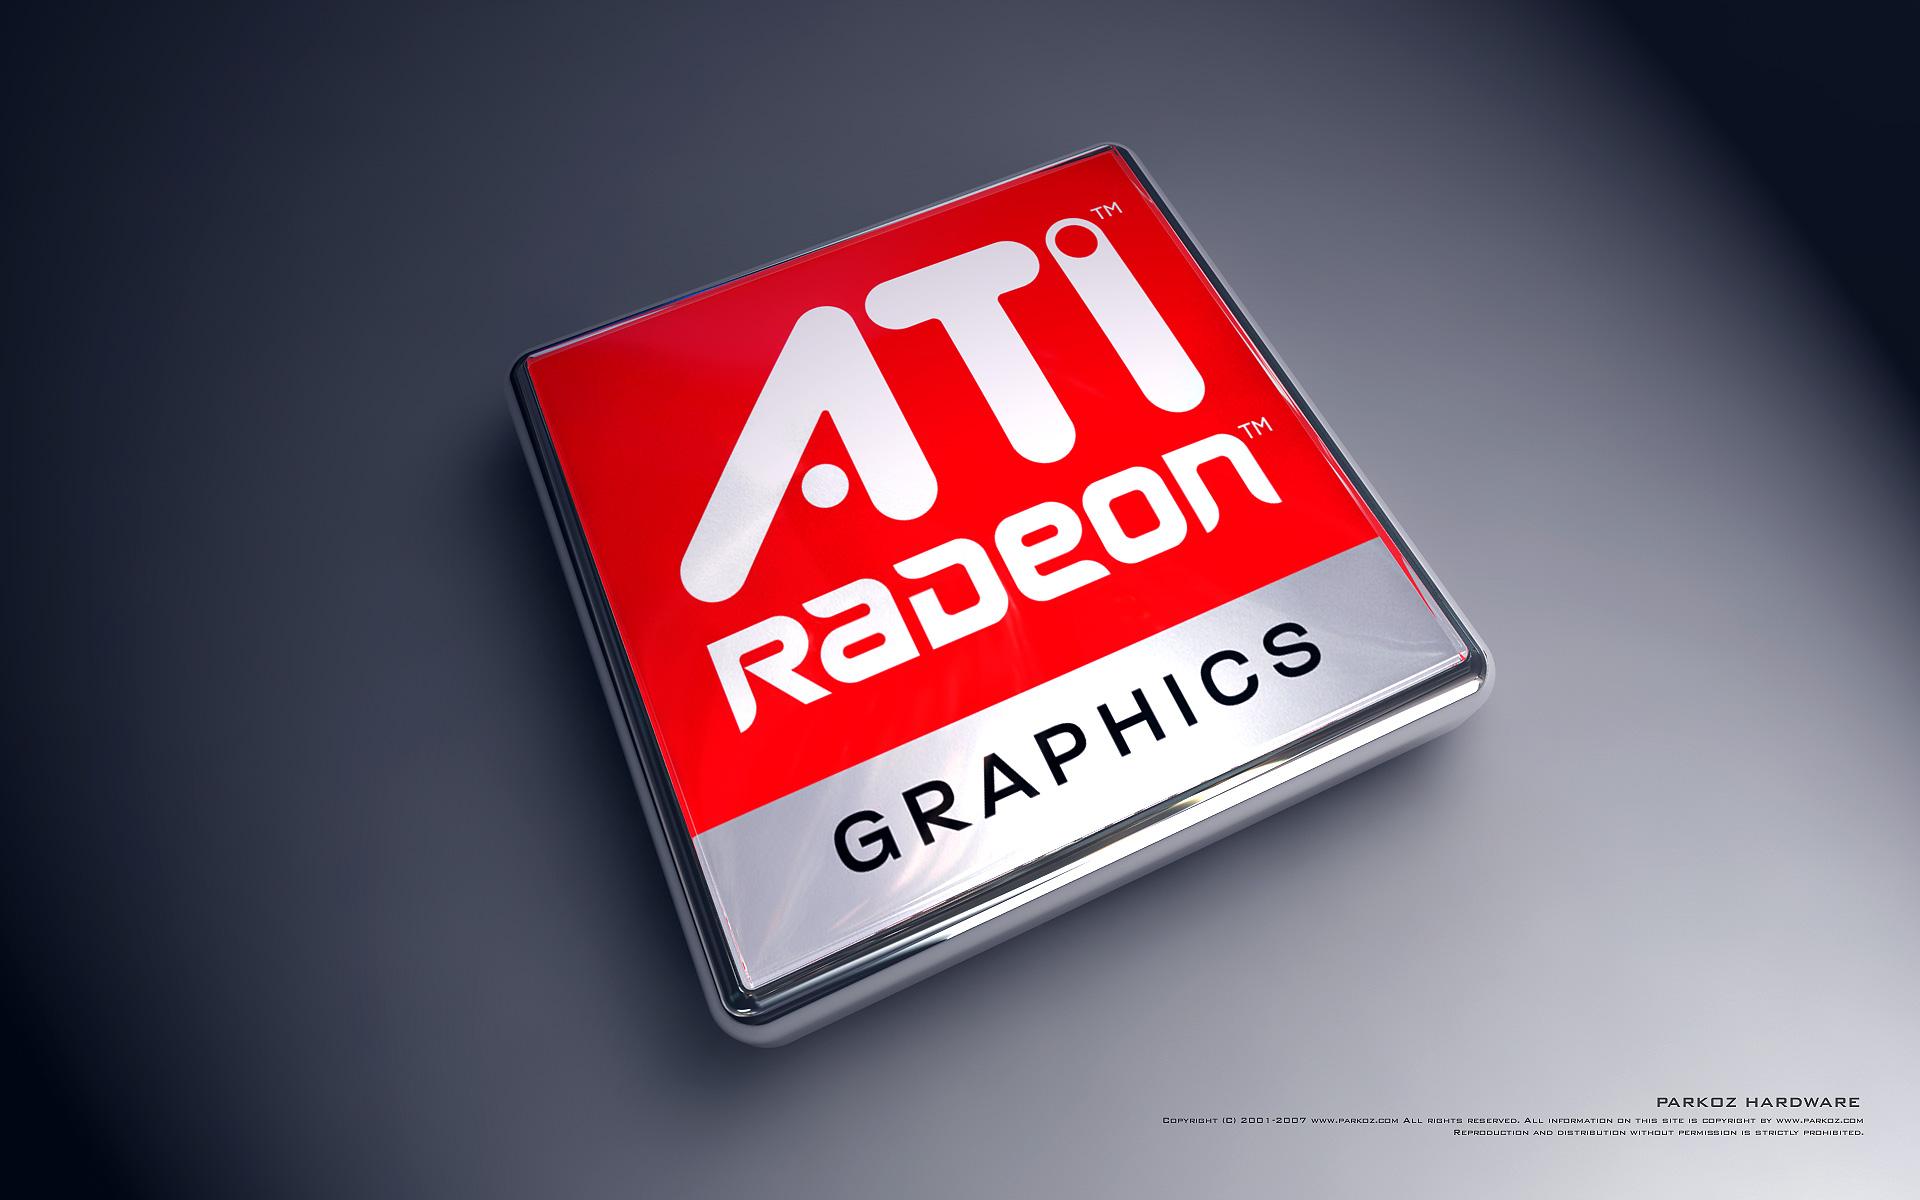 Ati Radeon Graphics Wallpapers HD Wallpapers 1920x1200